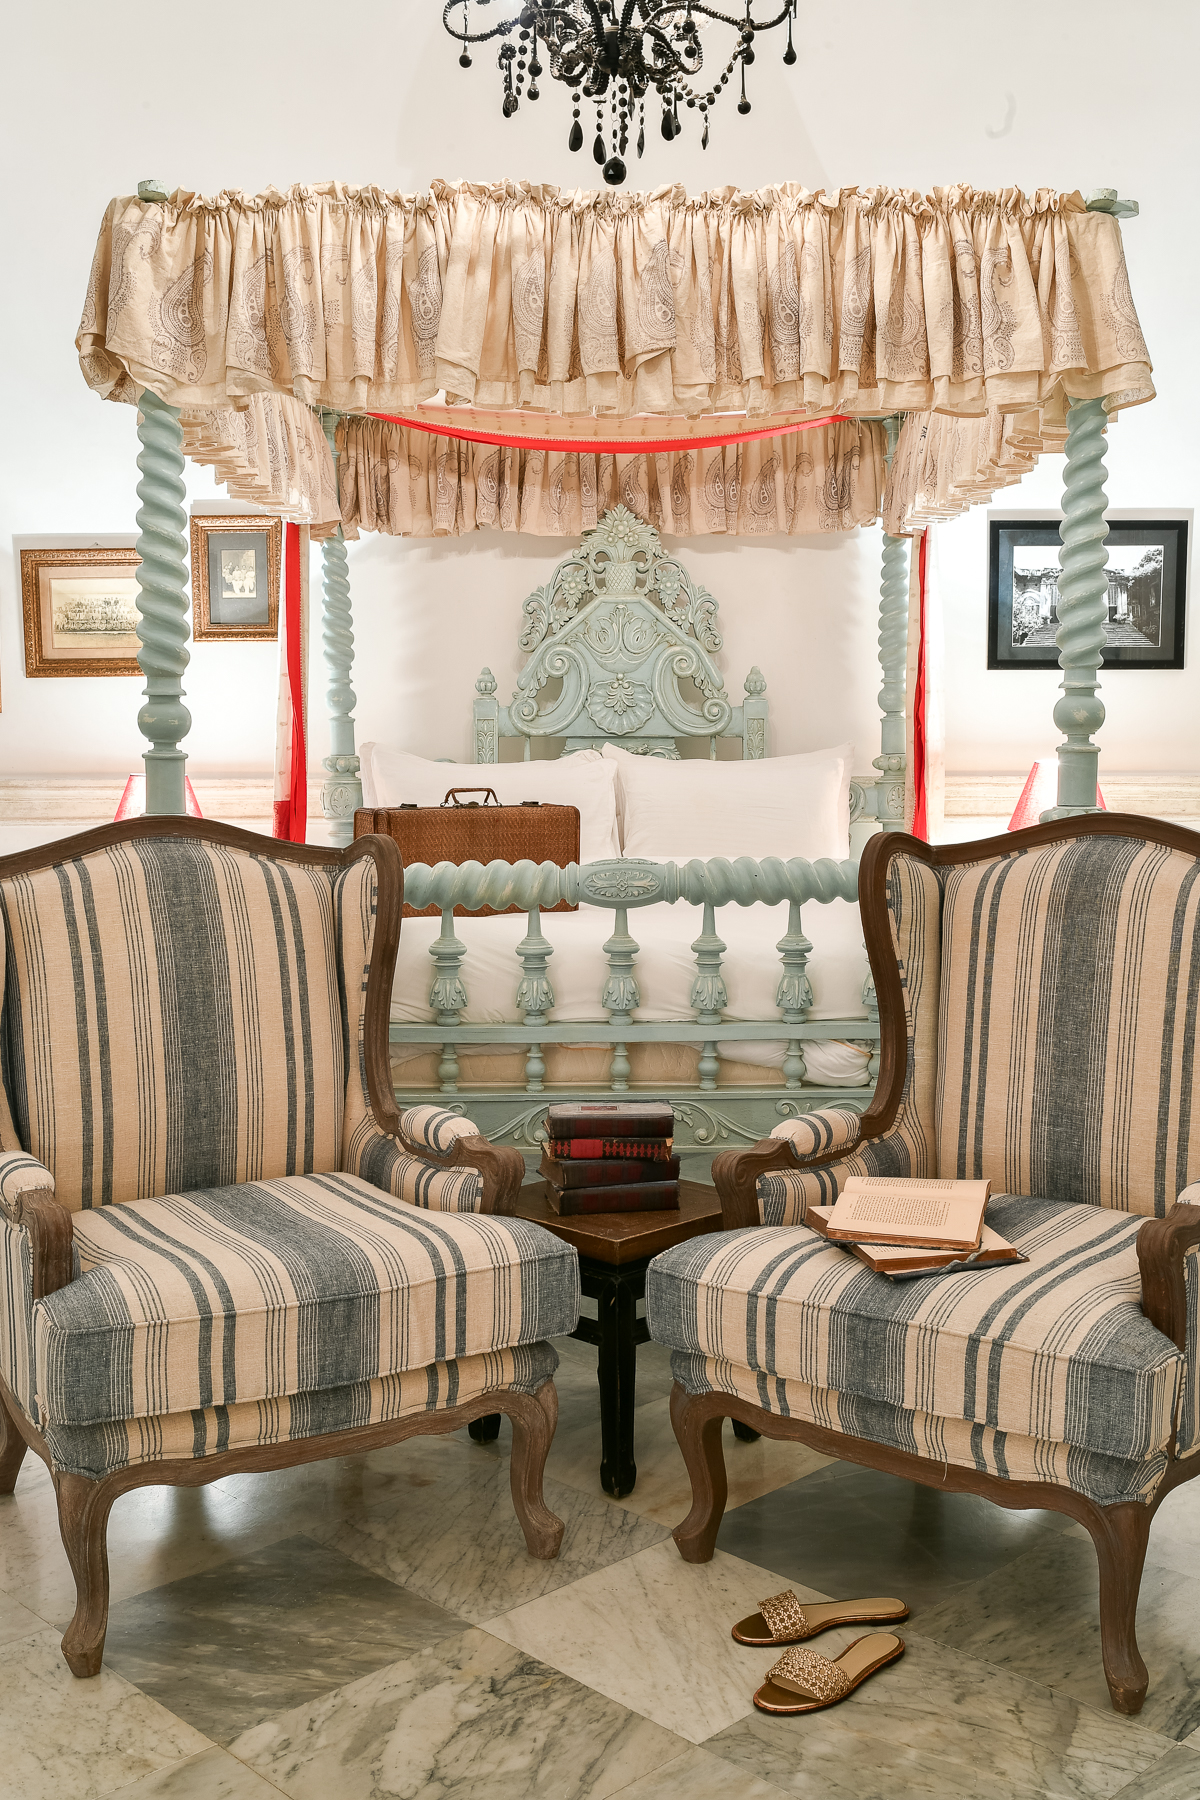 Stacie Flinner The Rajbari Bawali Heritage Hotel Calcutta-1.jpg